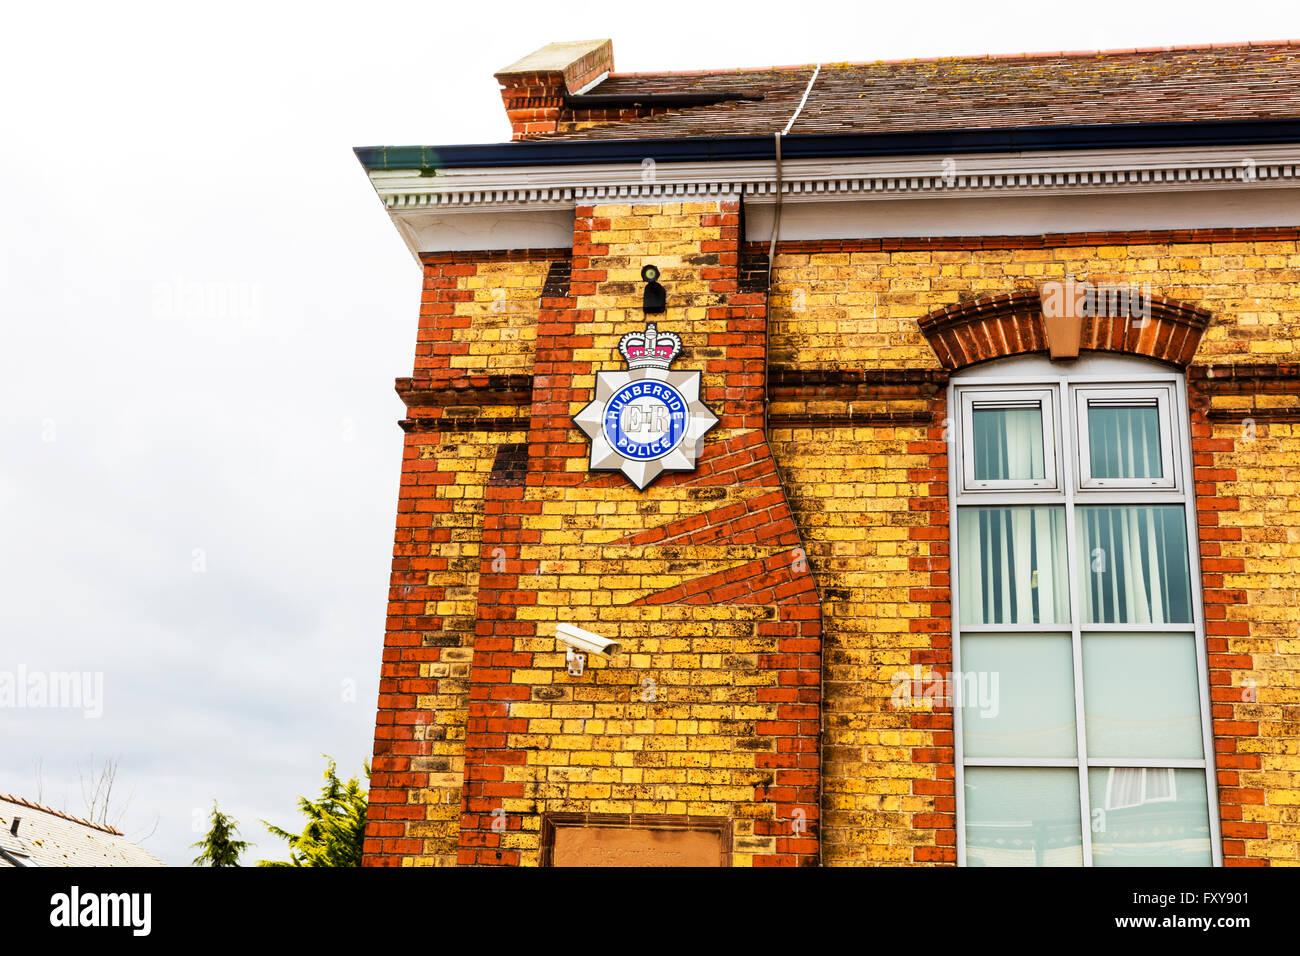 Humberside police station sign Bridlington police station building Yorkshire UK England town towns - Stock Image